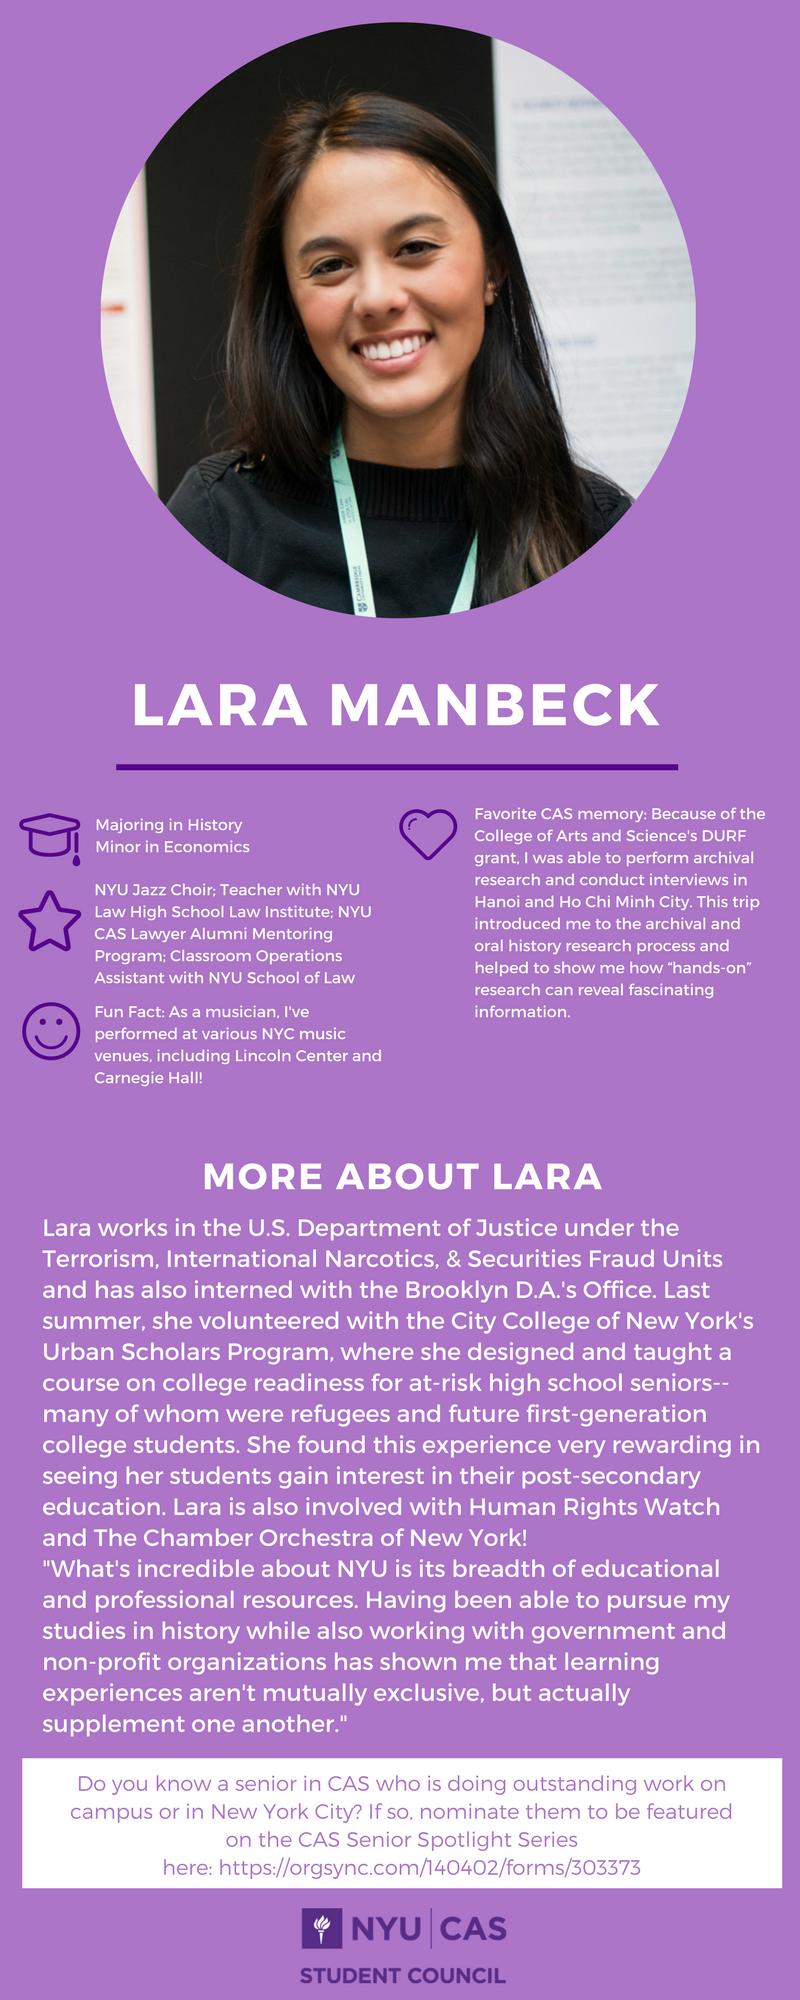 Lara Manbeck